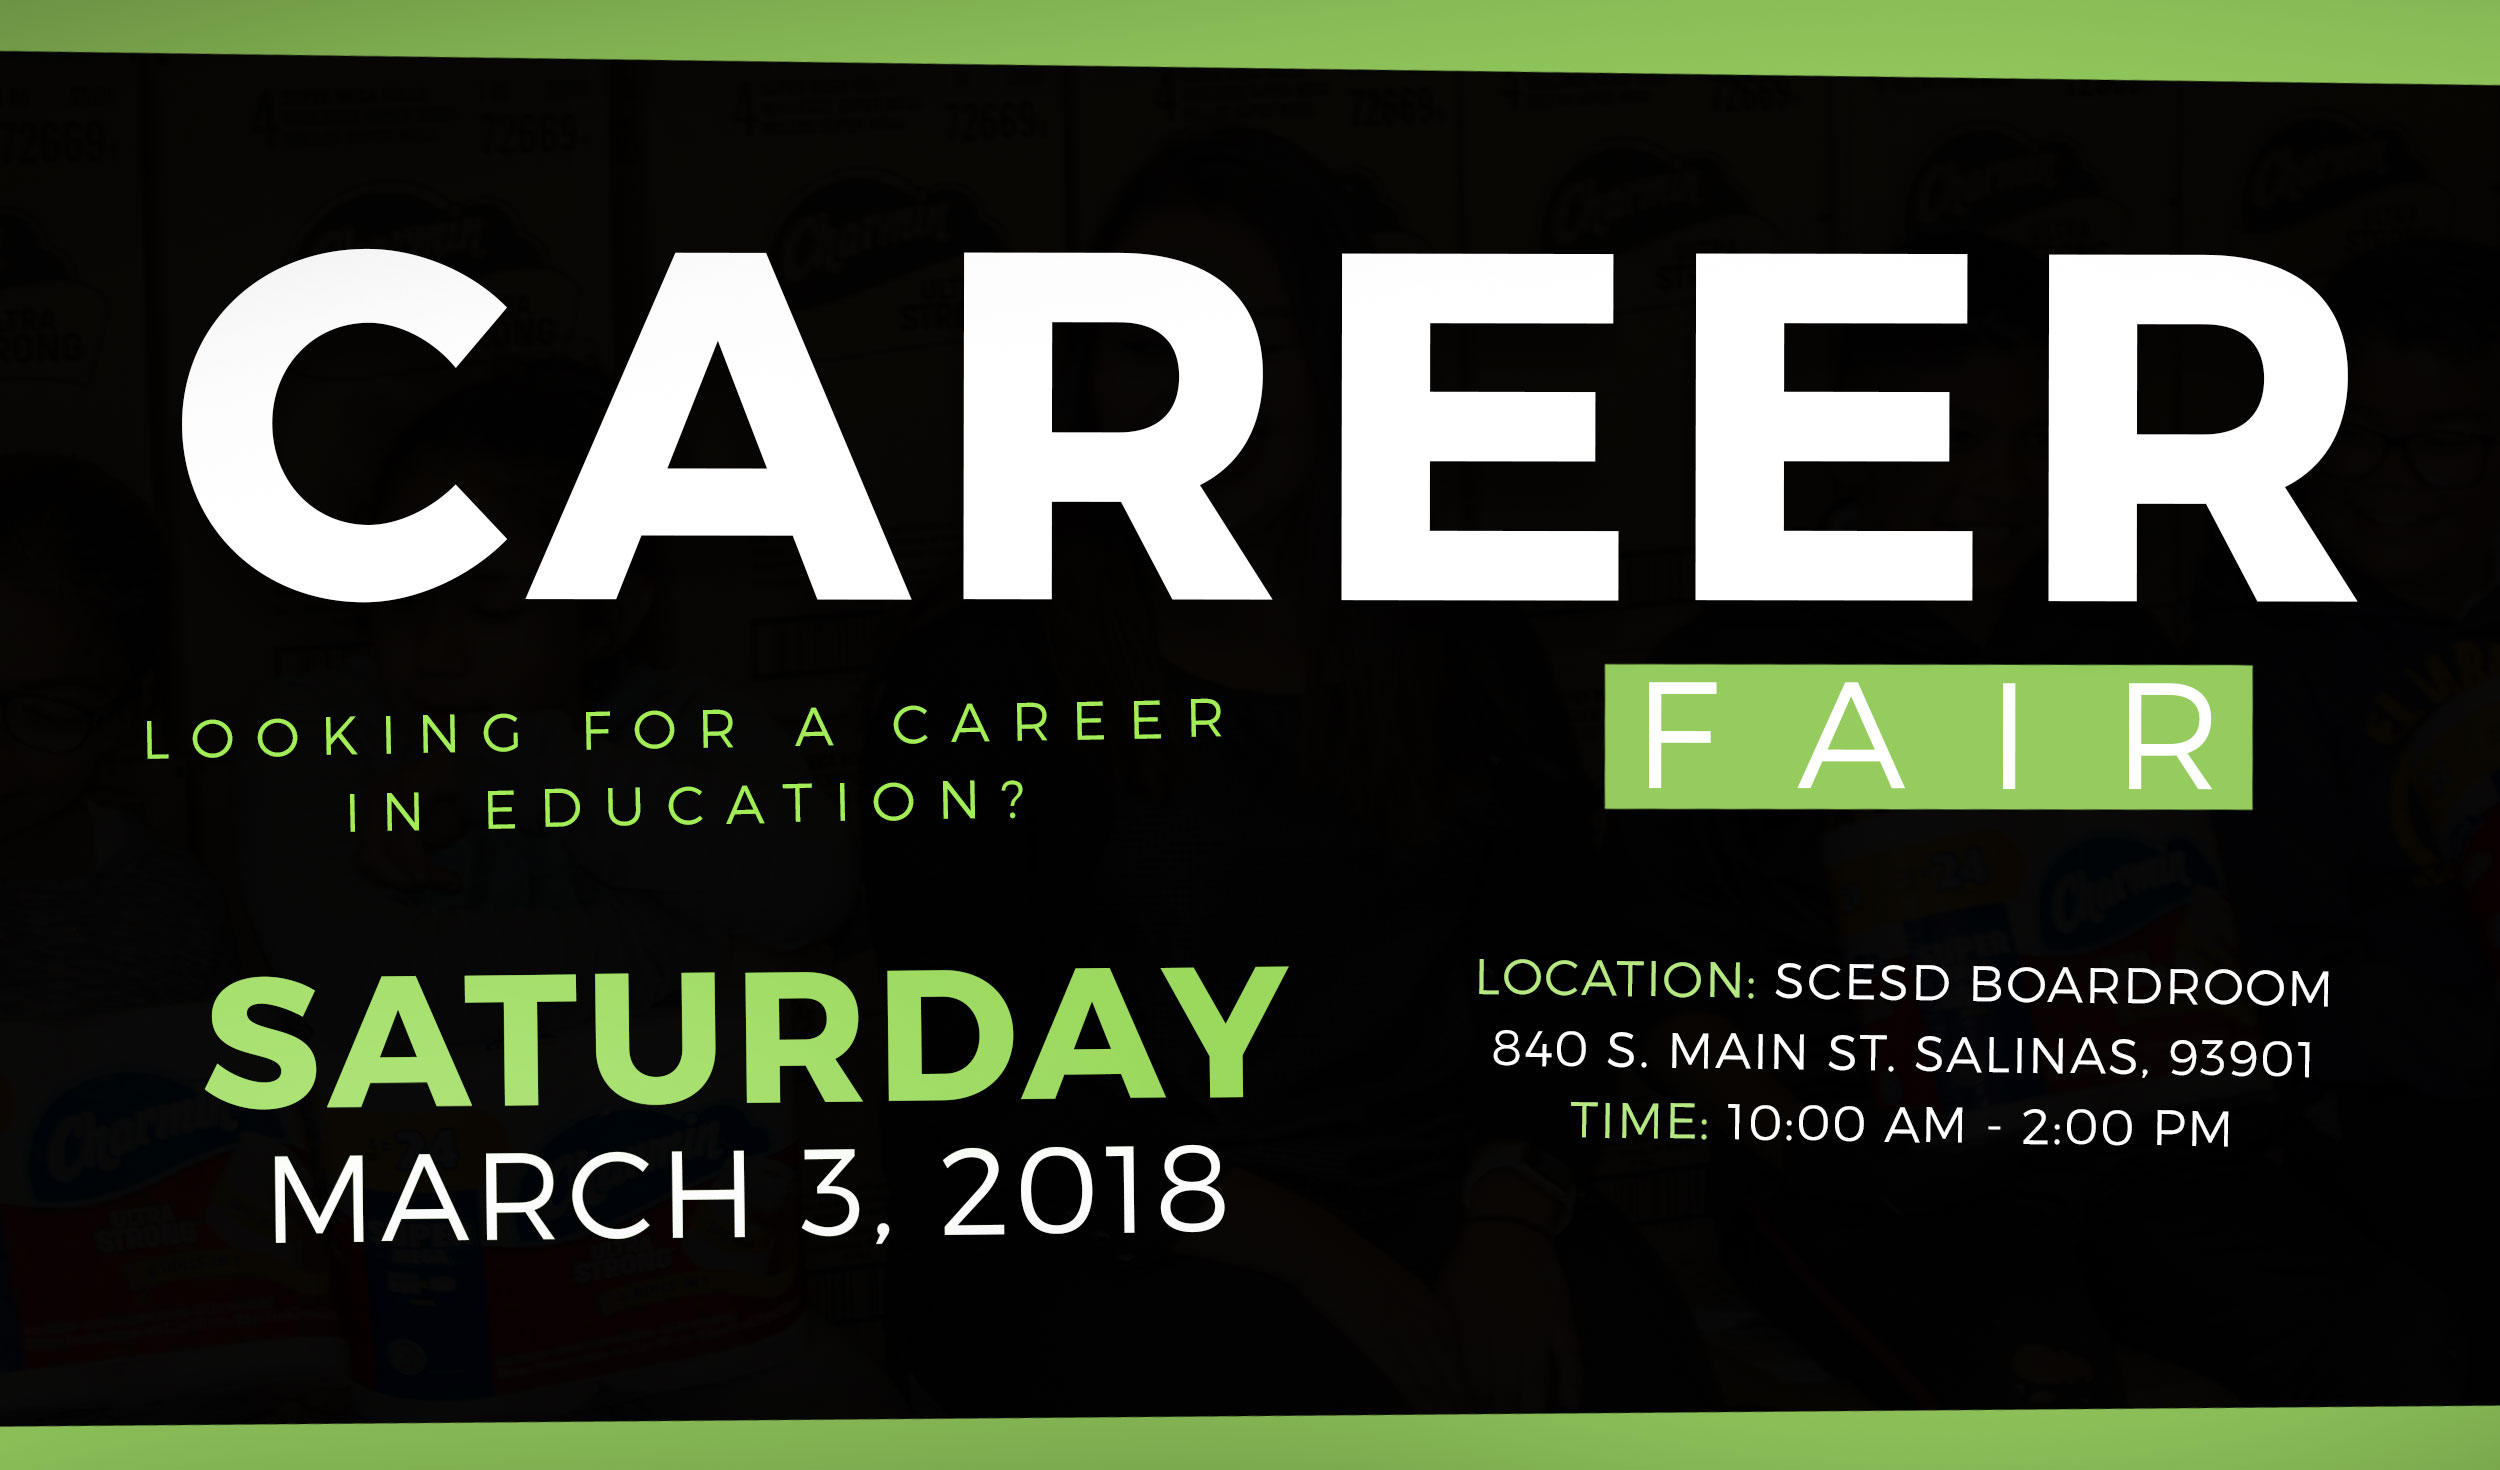 Career-Fair_Homepage-nobutton.jpg